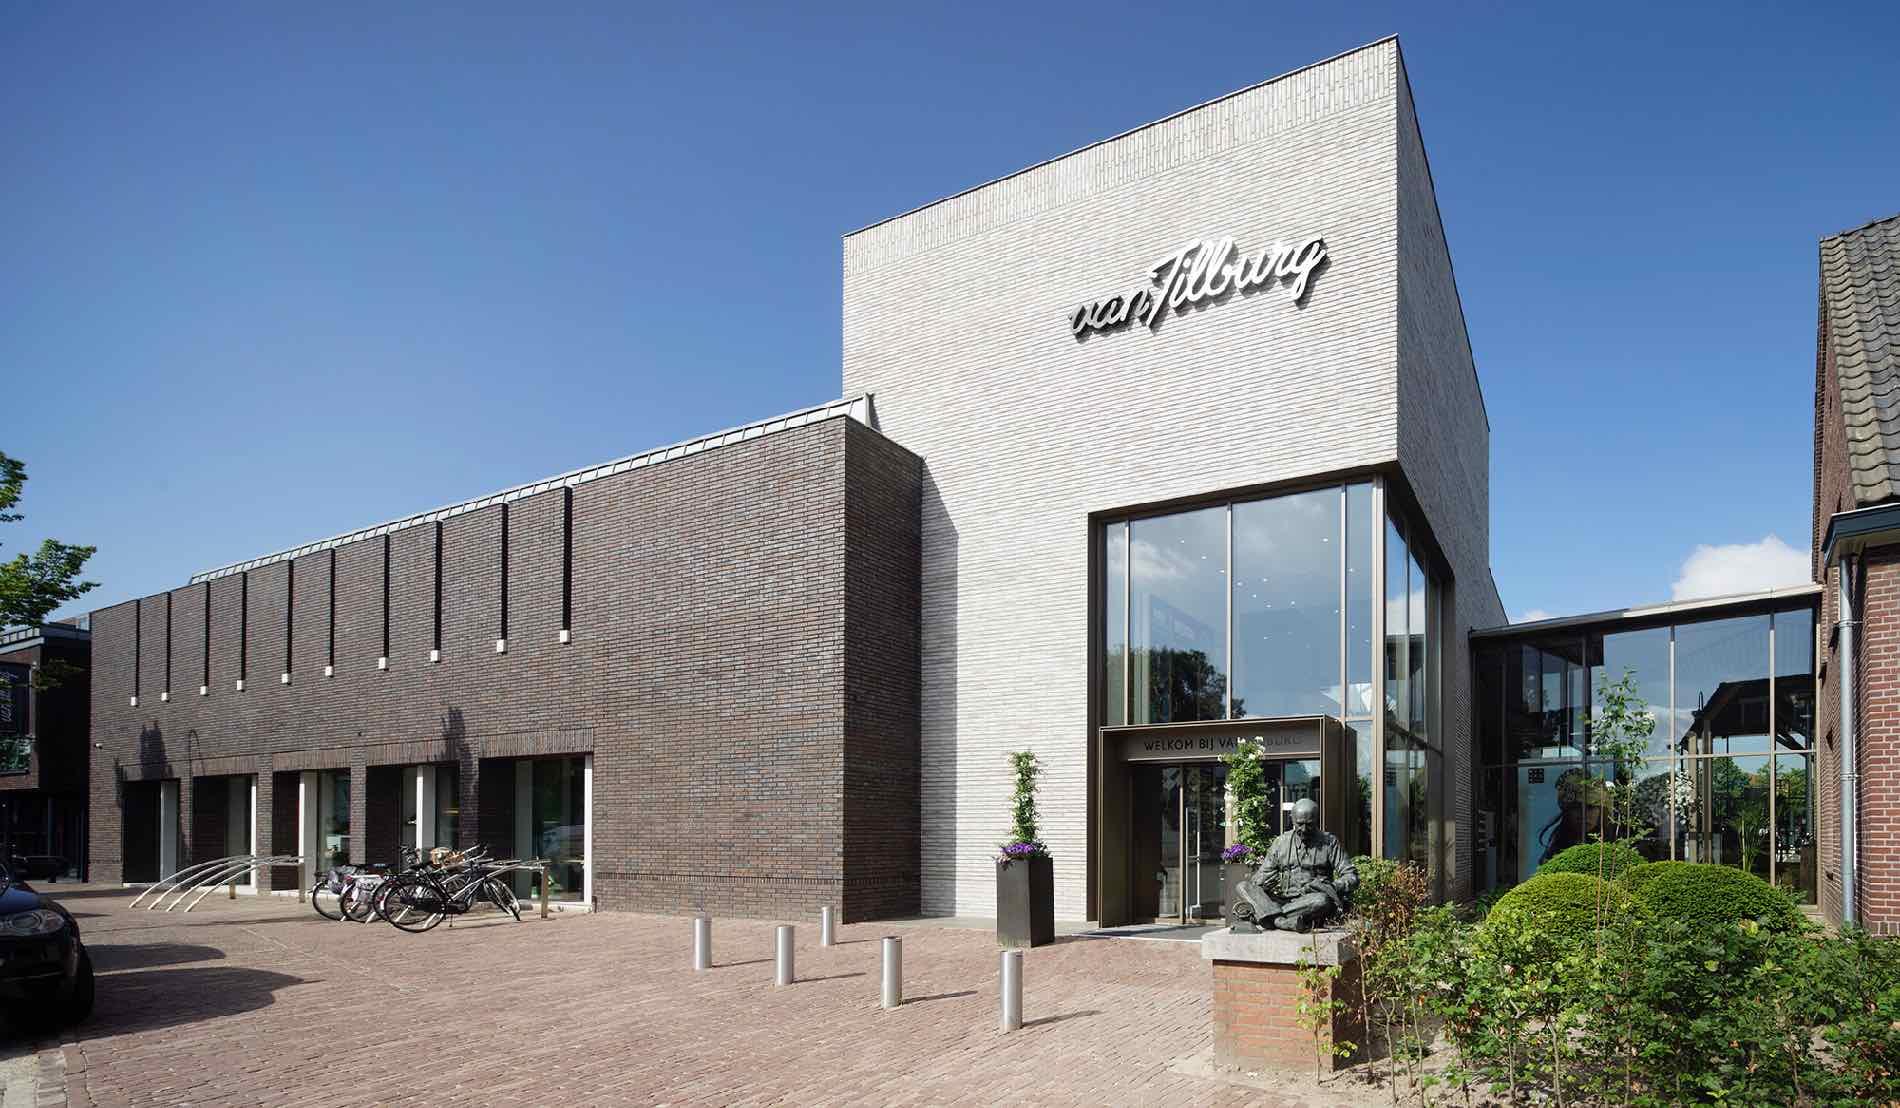 Van Tilburg Mode Tassen : Steenhandel gelsing van tilburg mode sport nistelrode